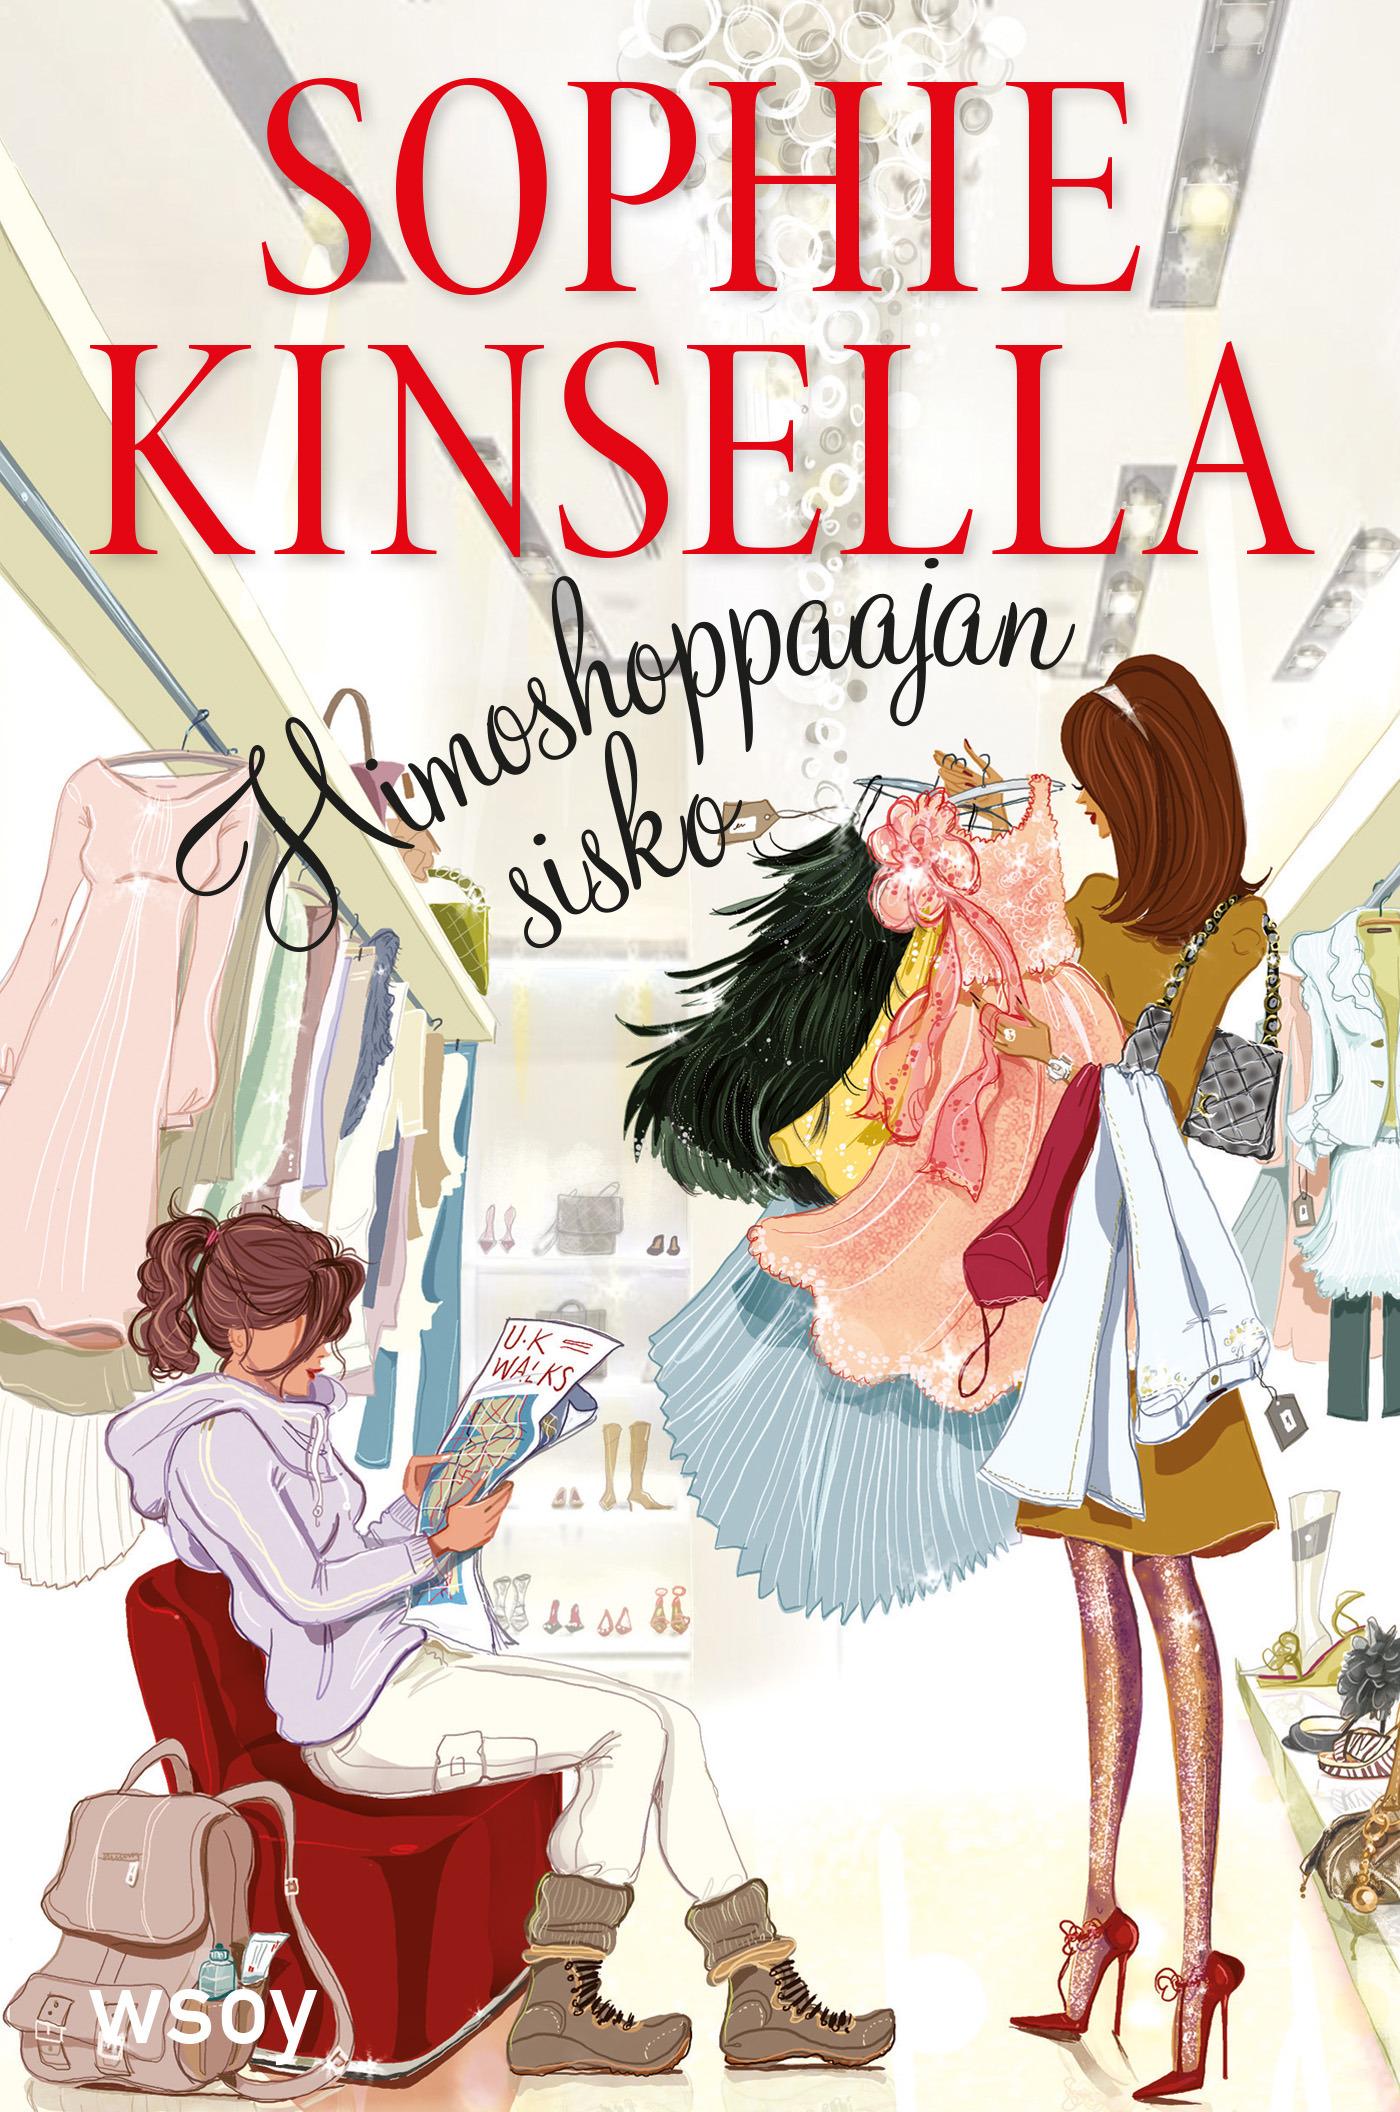 Kinsella, Sophie - Himoshoppaajan sisko: Himoshoppaaja 4, e-kirja